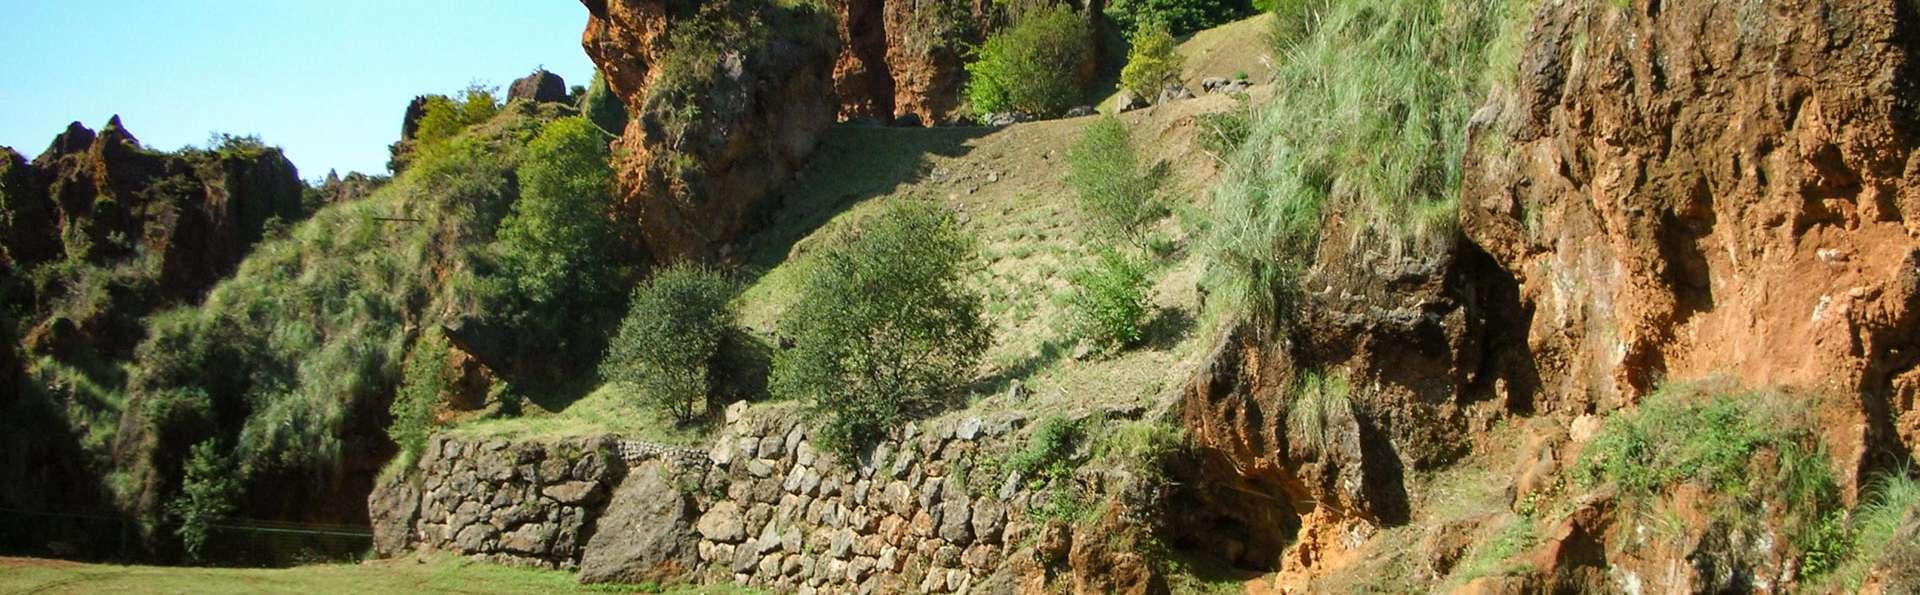 Sercotel Las Rocas  - EDIT_SURROUNDING_02.jpg